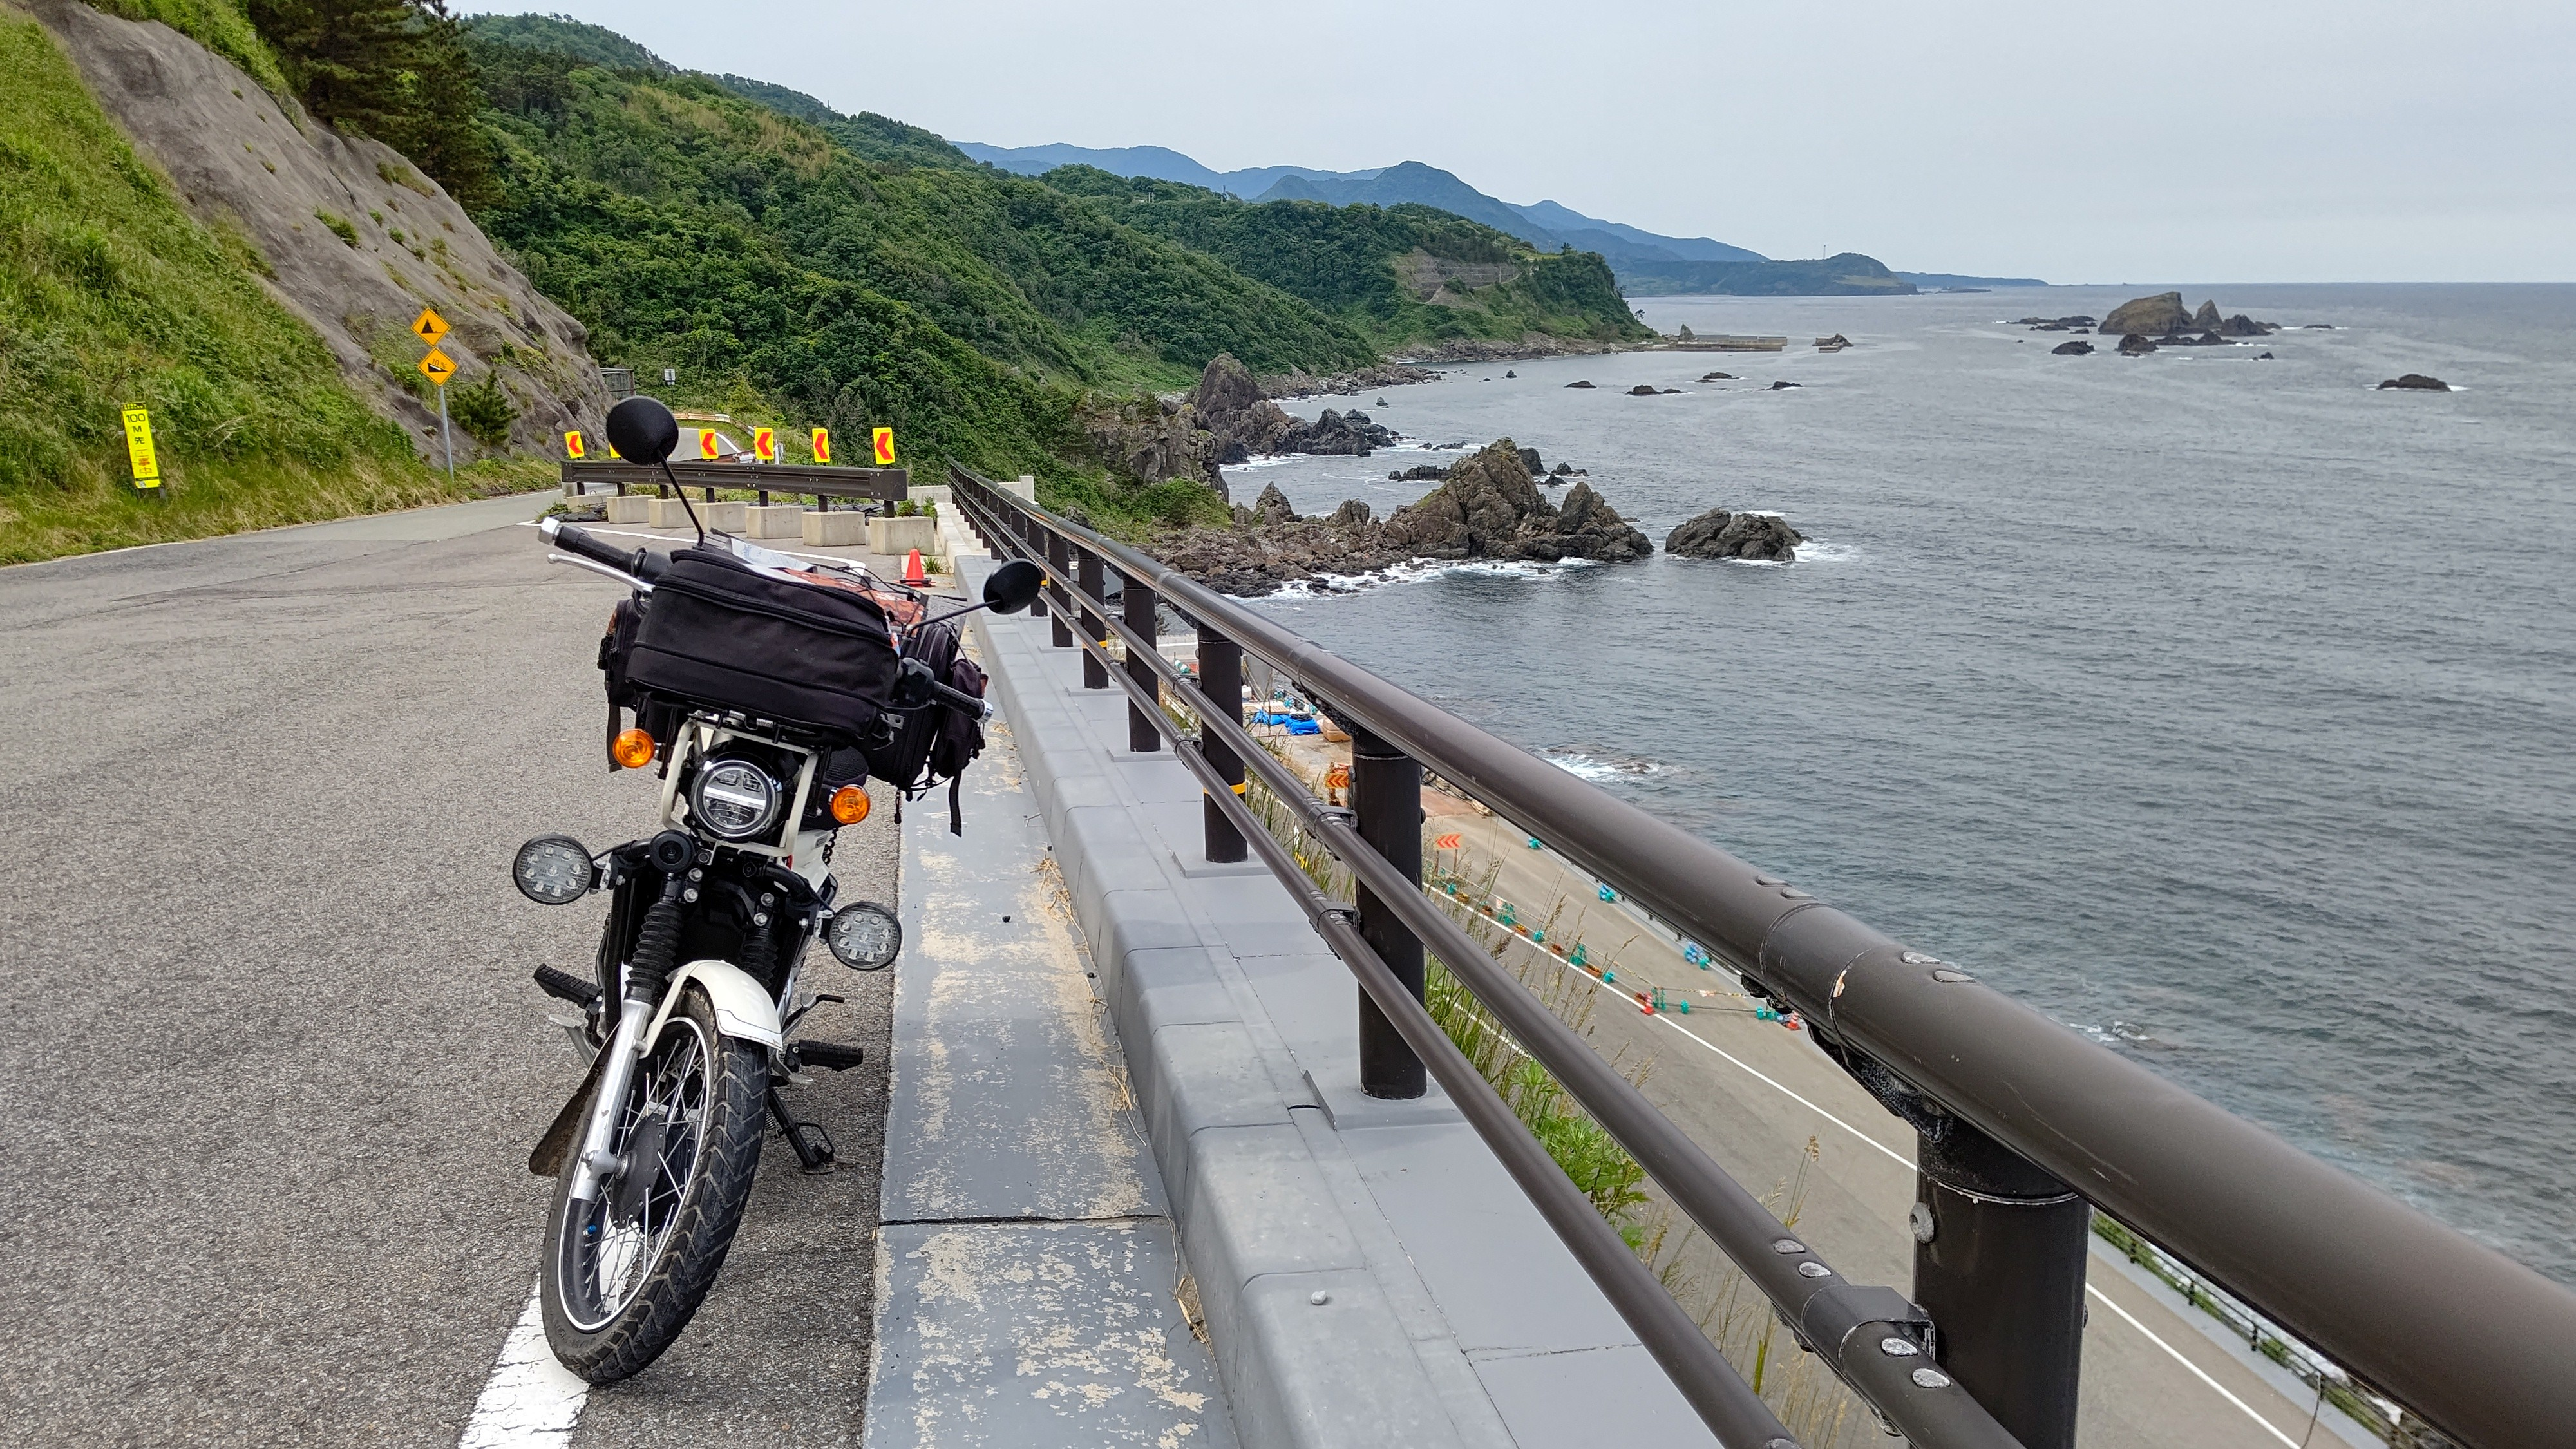 f:id:Tsubasaba:20210703224757j:image